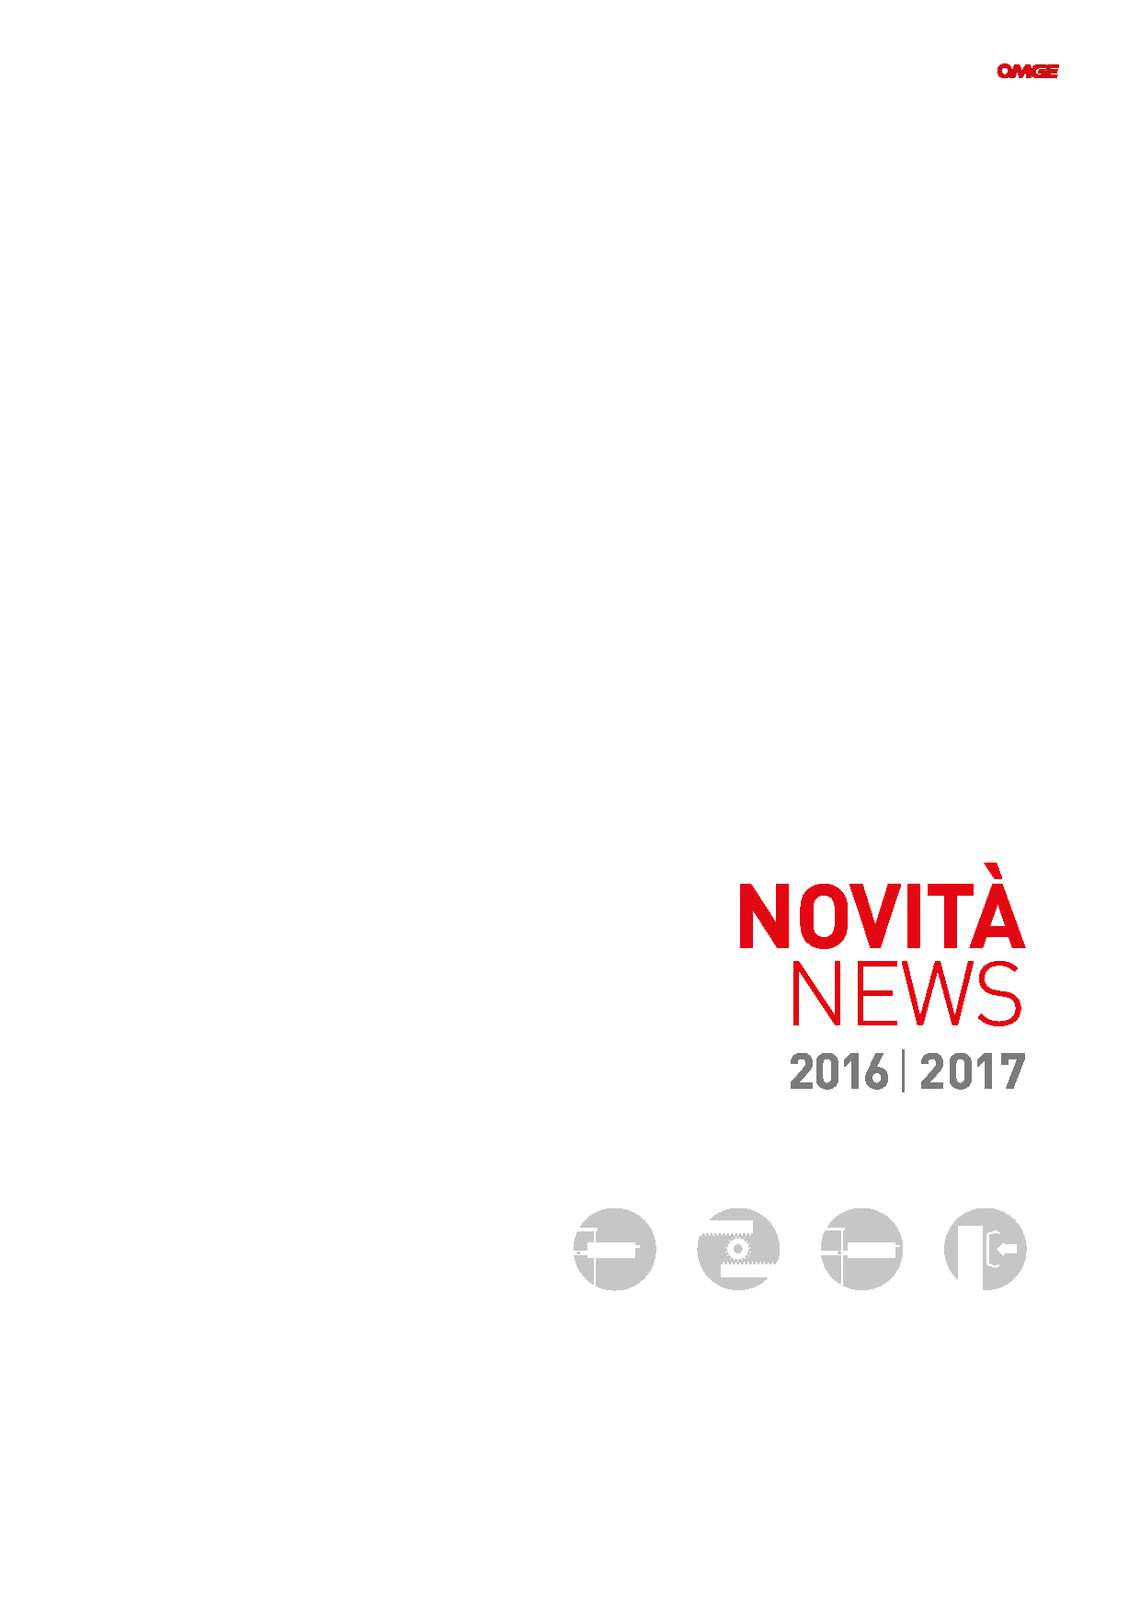 news-20162017_134_002.jpg